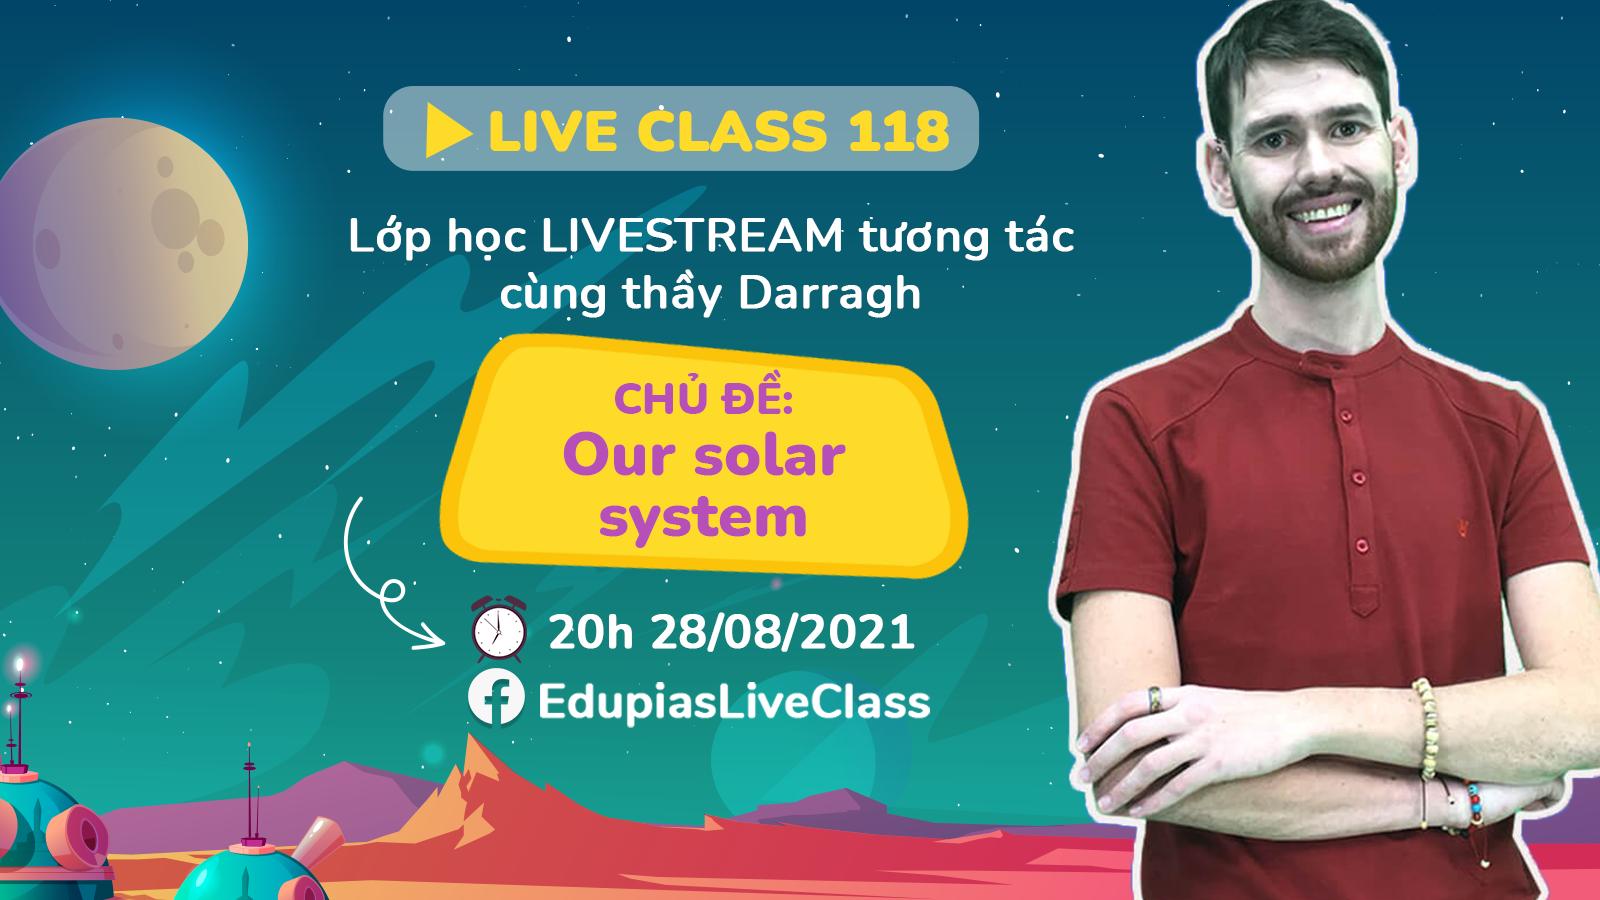 Live class tuần 118 - Chủ đề: Our solar system